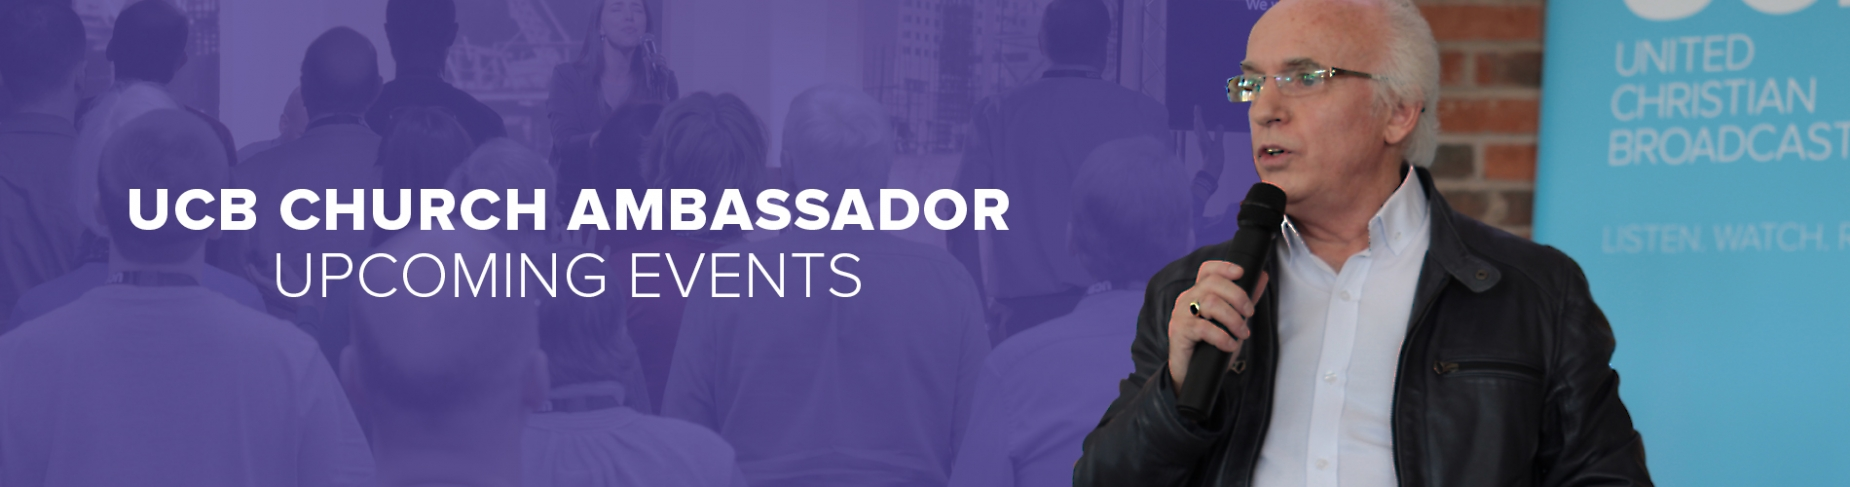 UCB Church Ambassador Planned Events Calendar